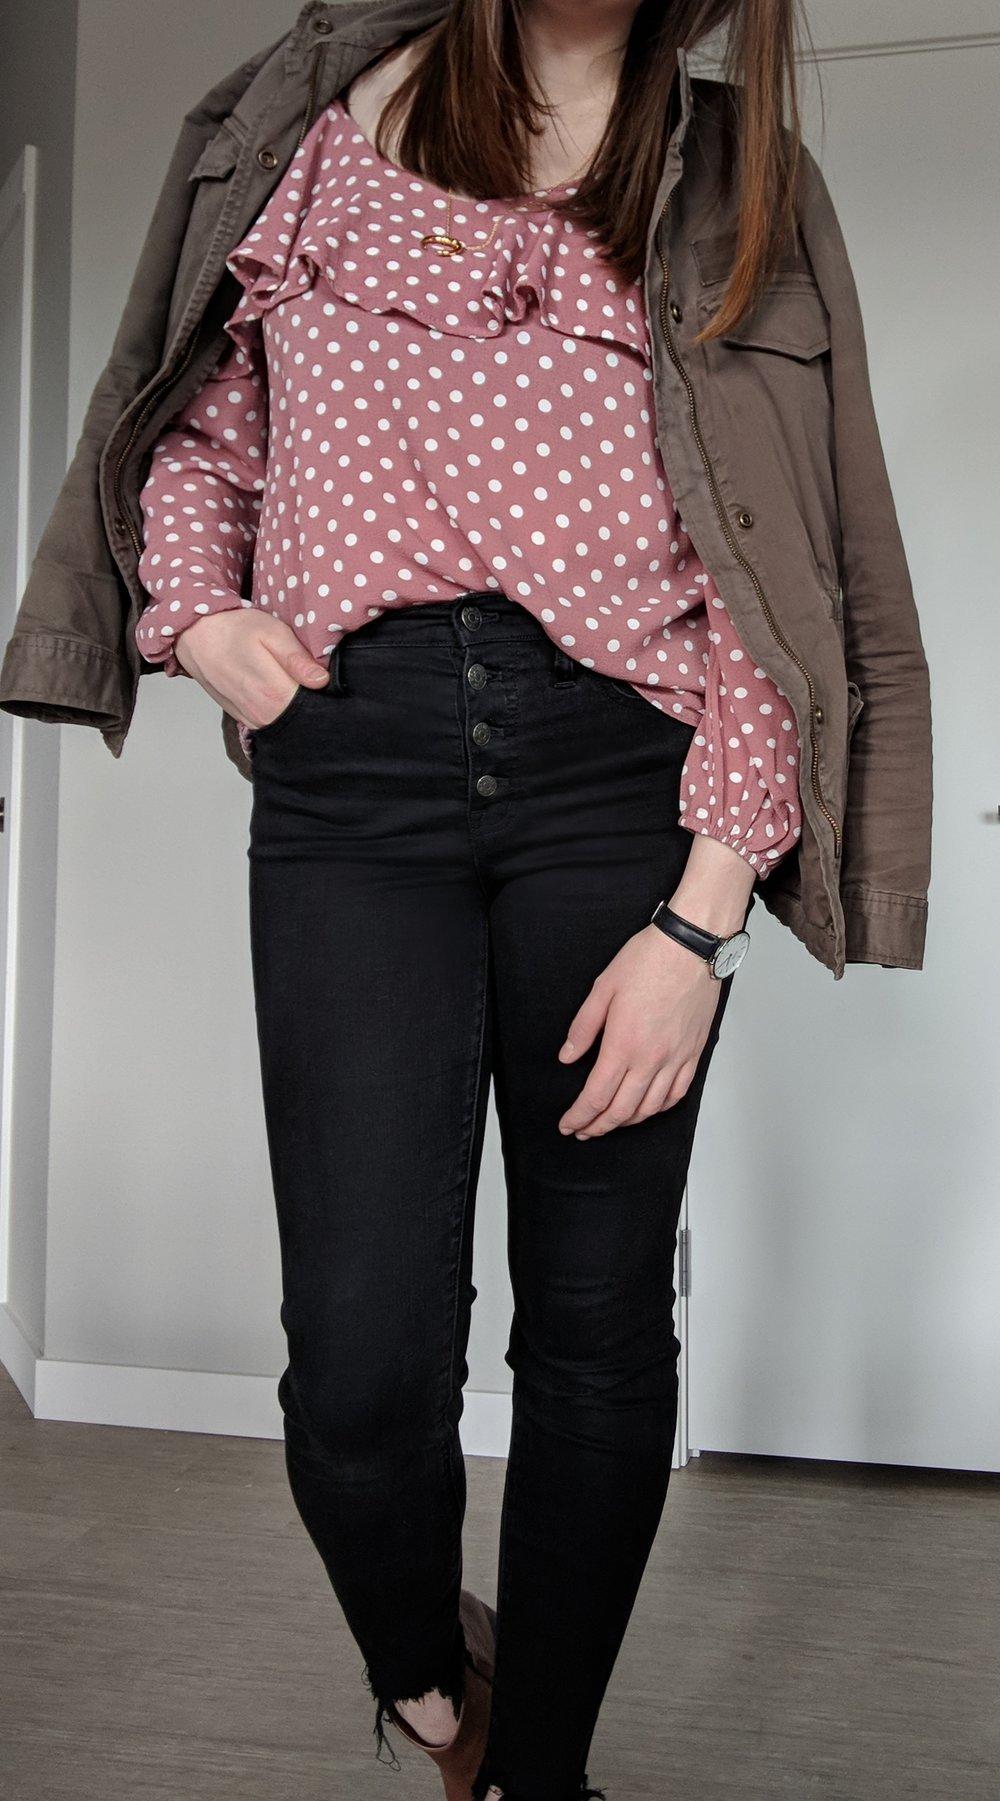 pink polka dot shirt